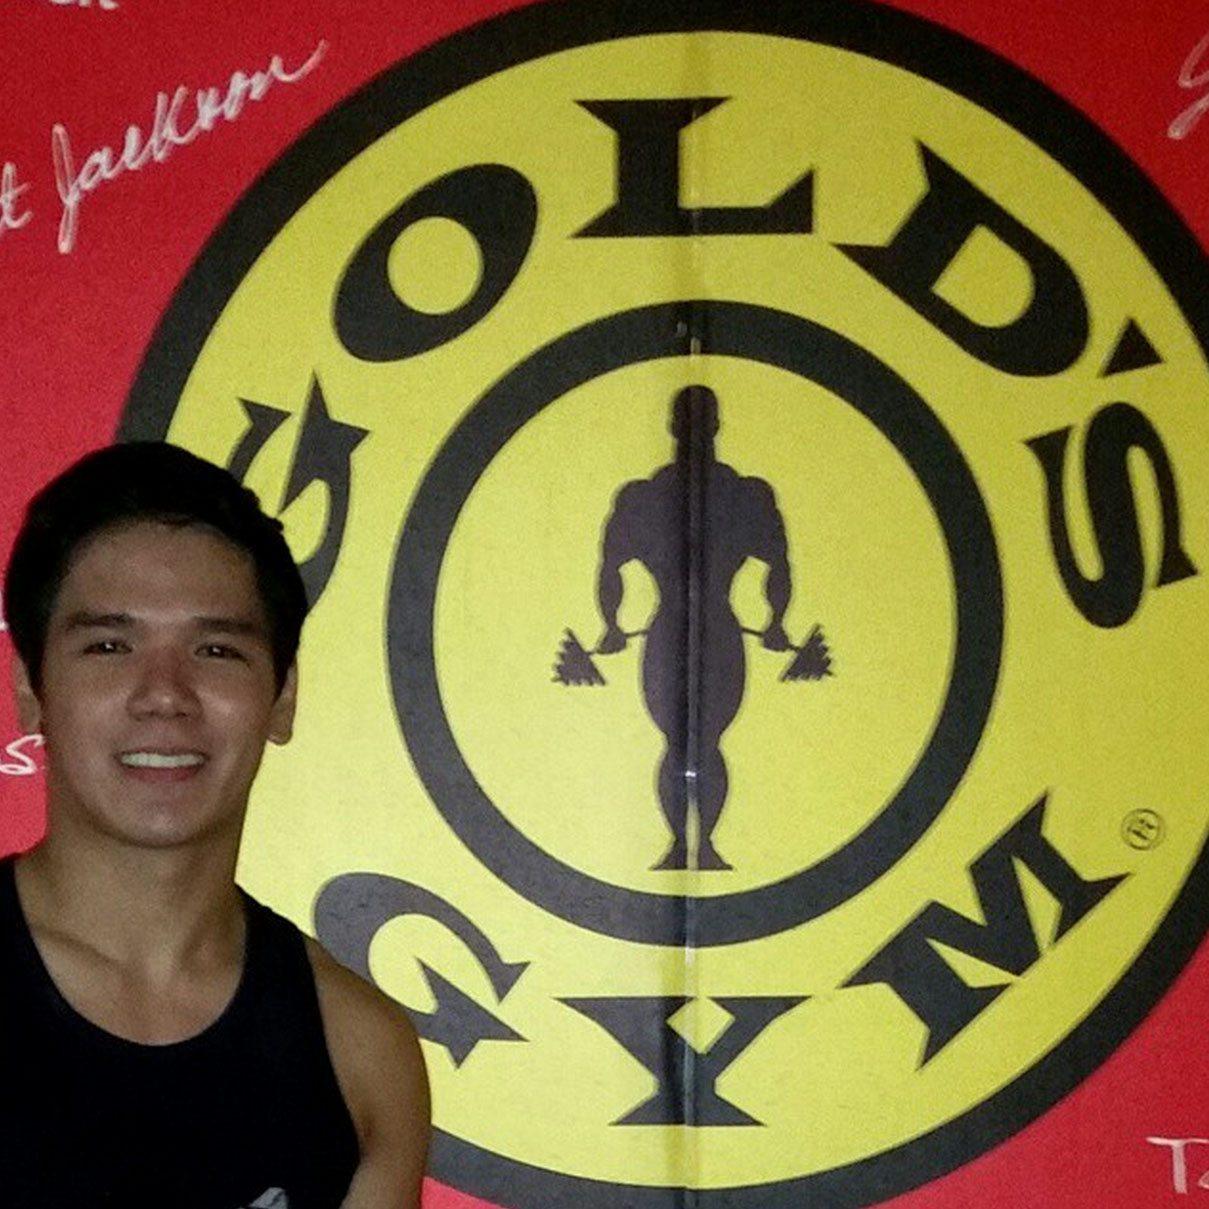 gerald santos goes to golds gym